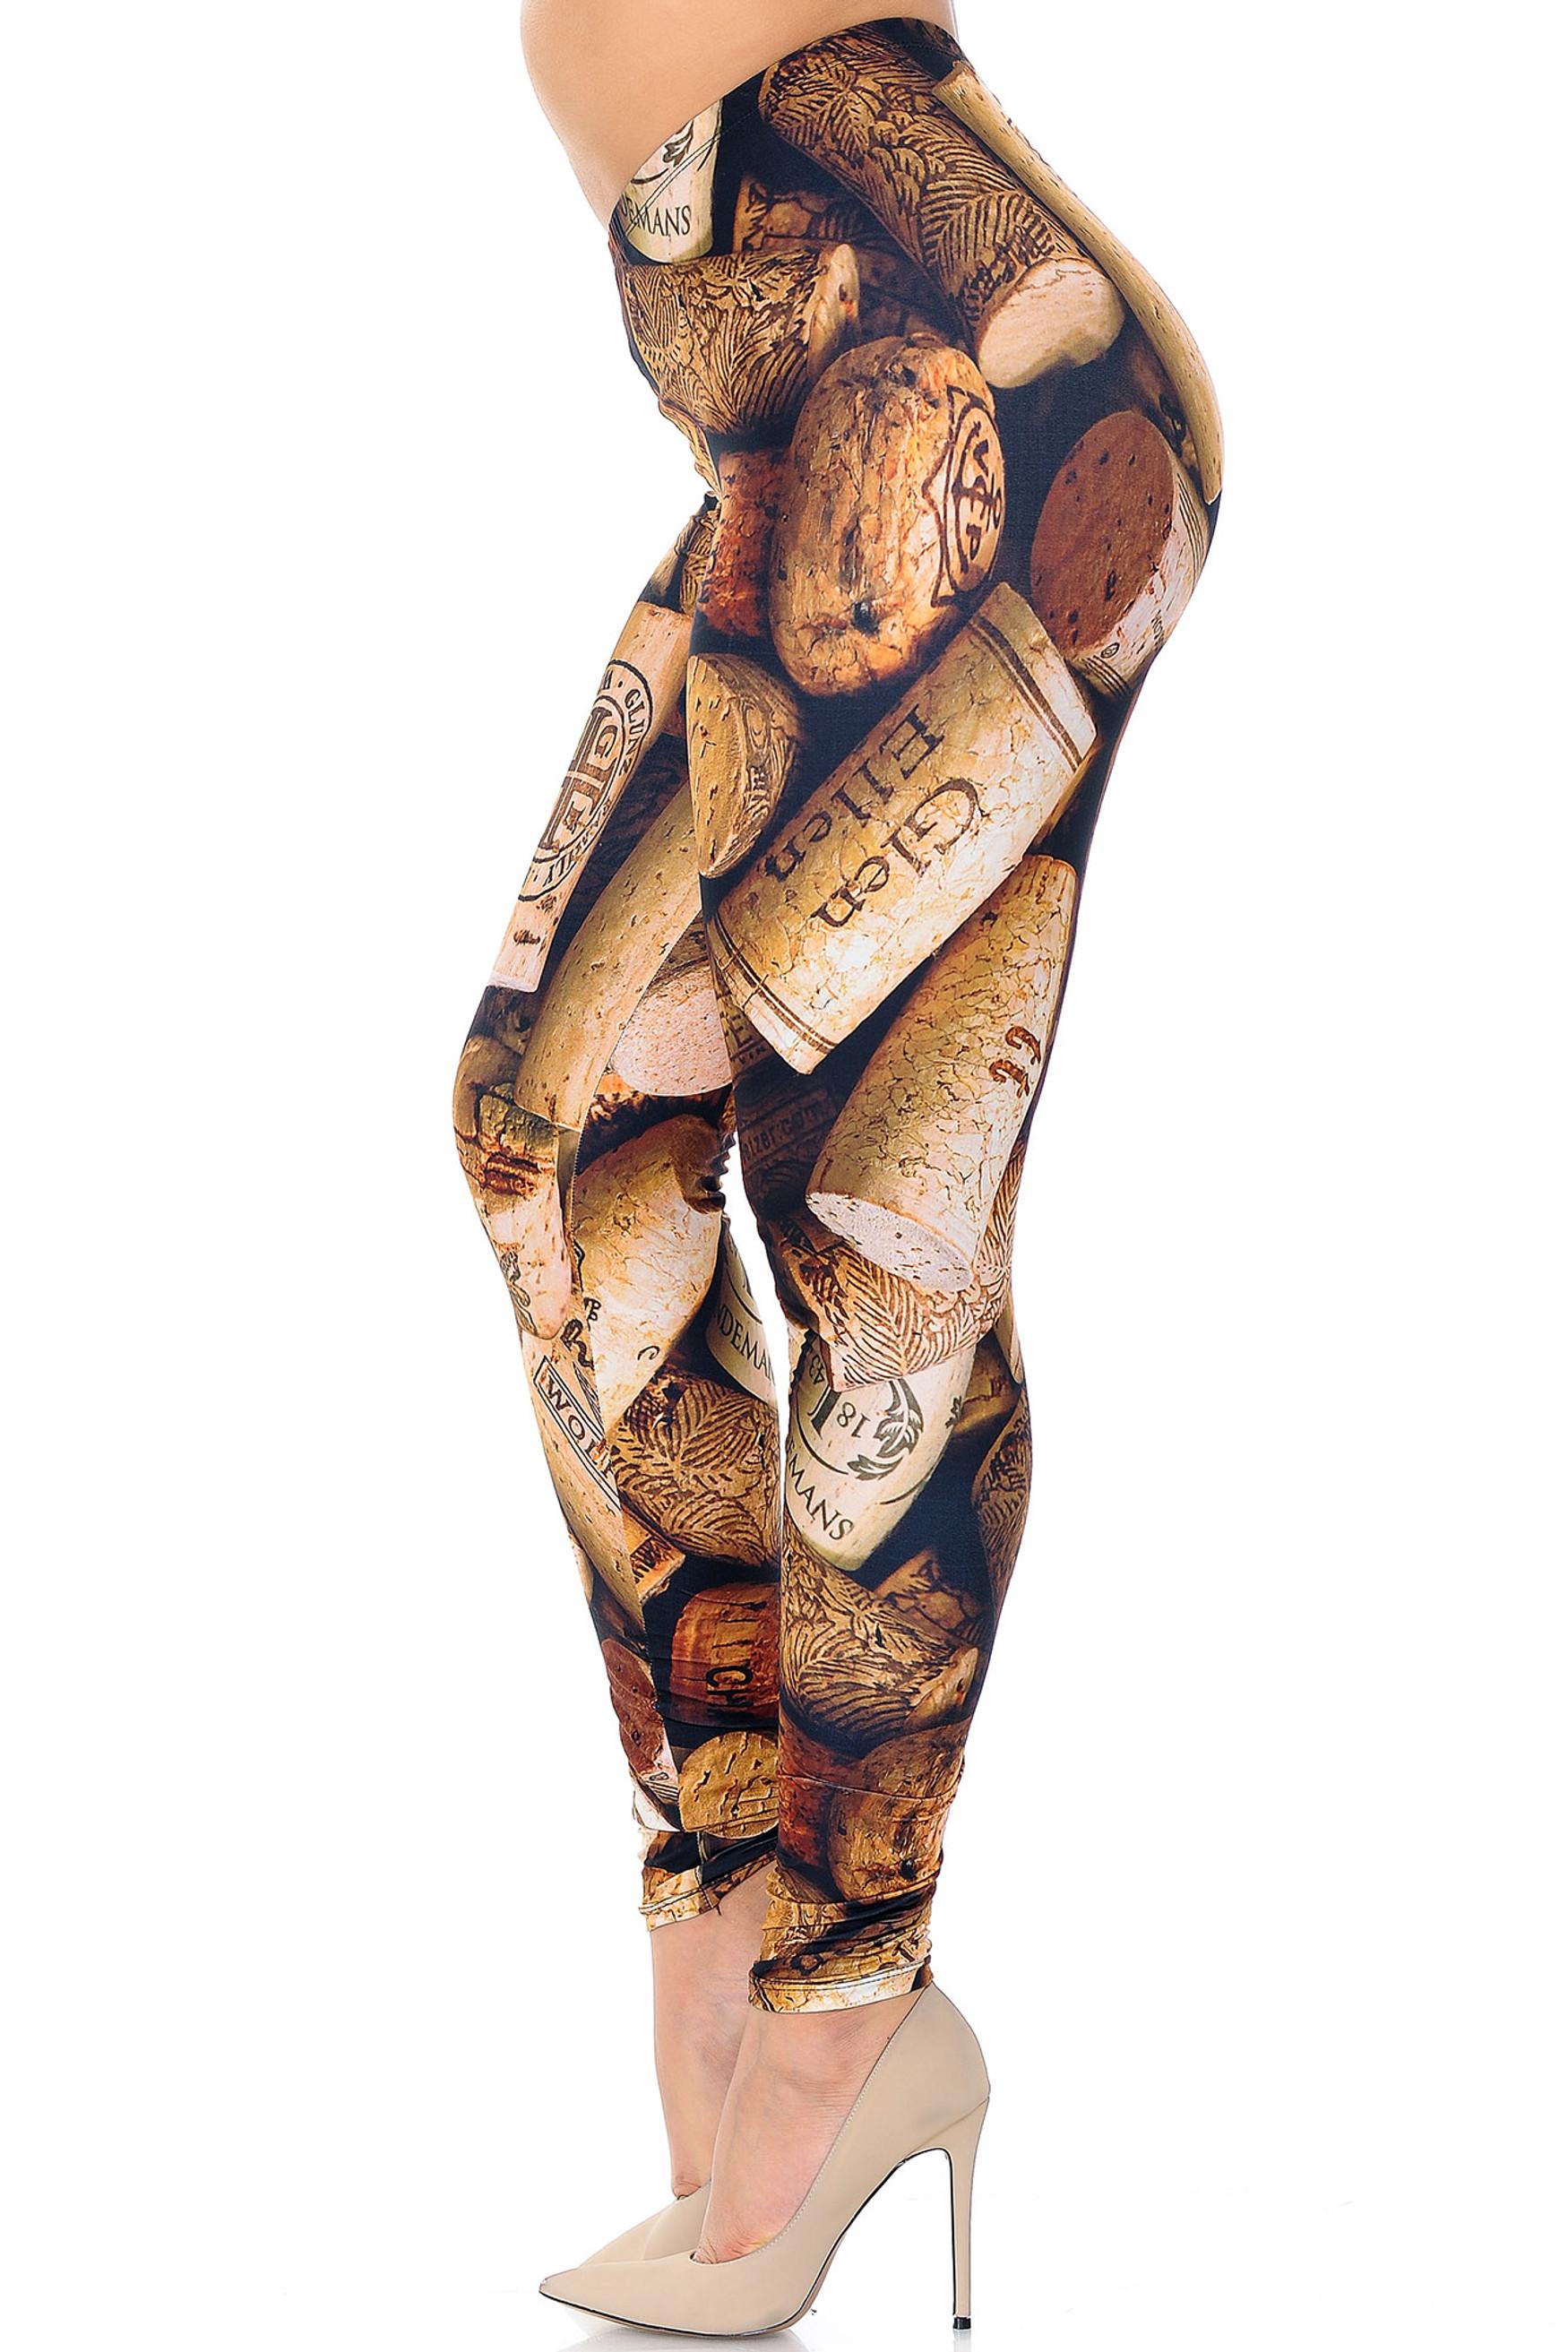 Creamy Soft Wine Cork Extra Plus Size Leggings - 3X-5 - USA Fashion™